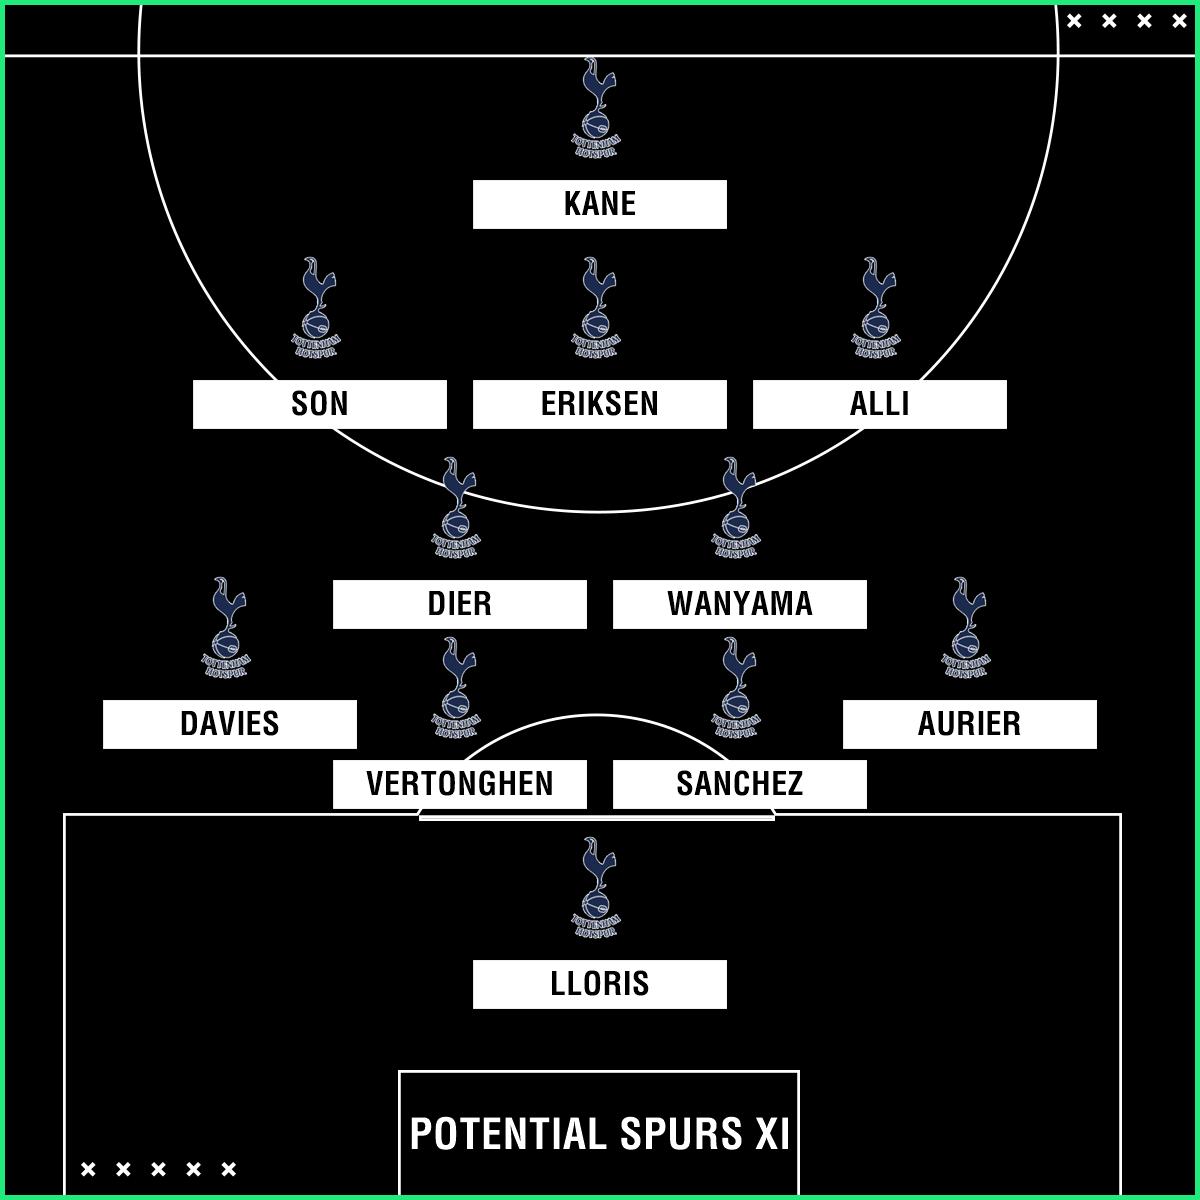 Potential Spurs XI